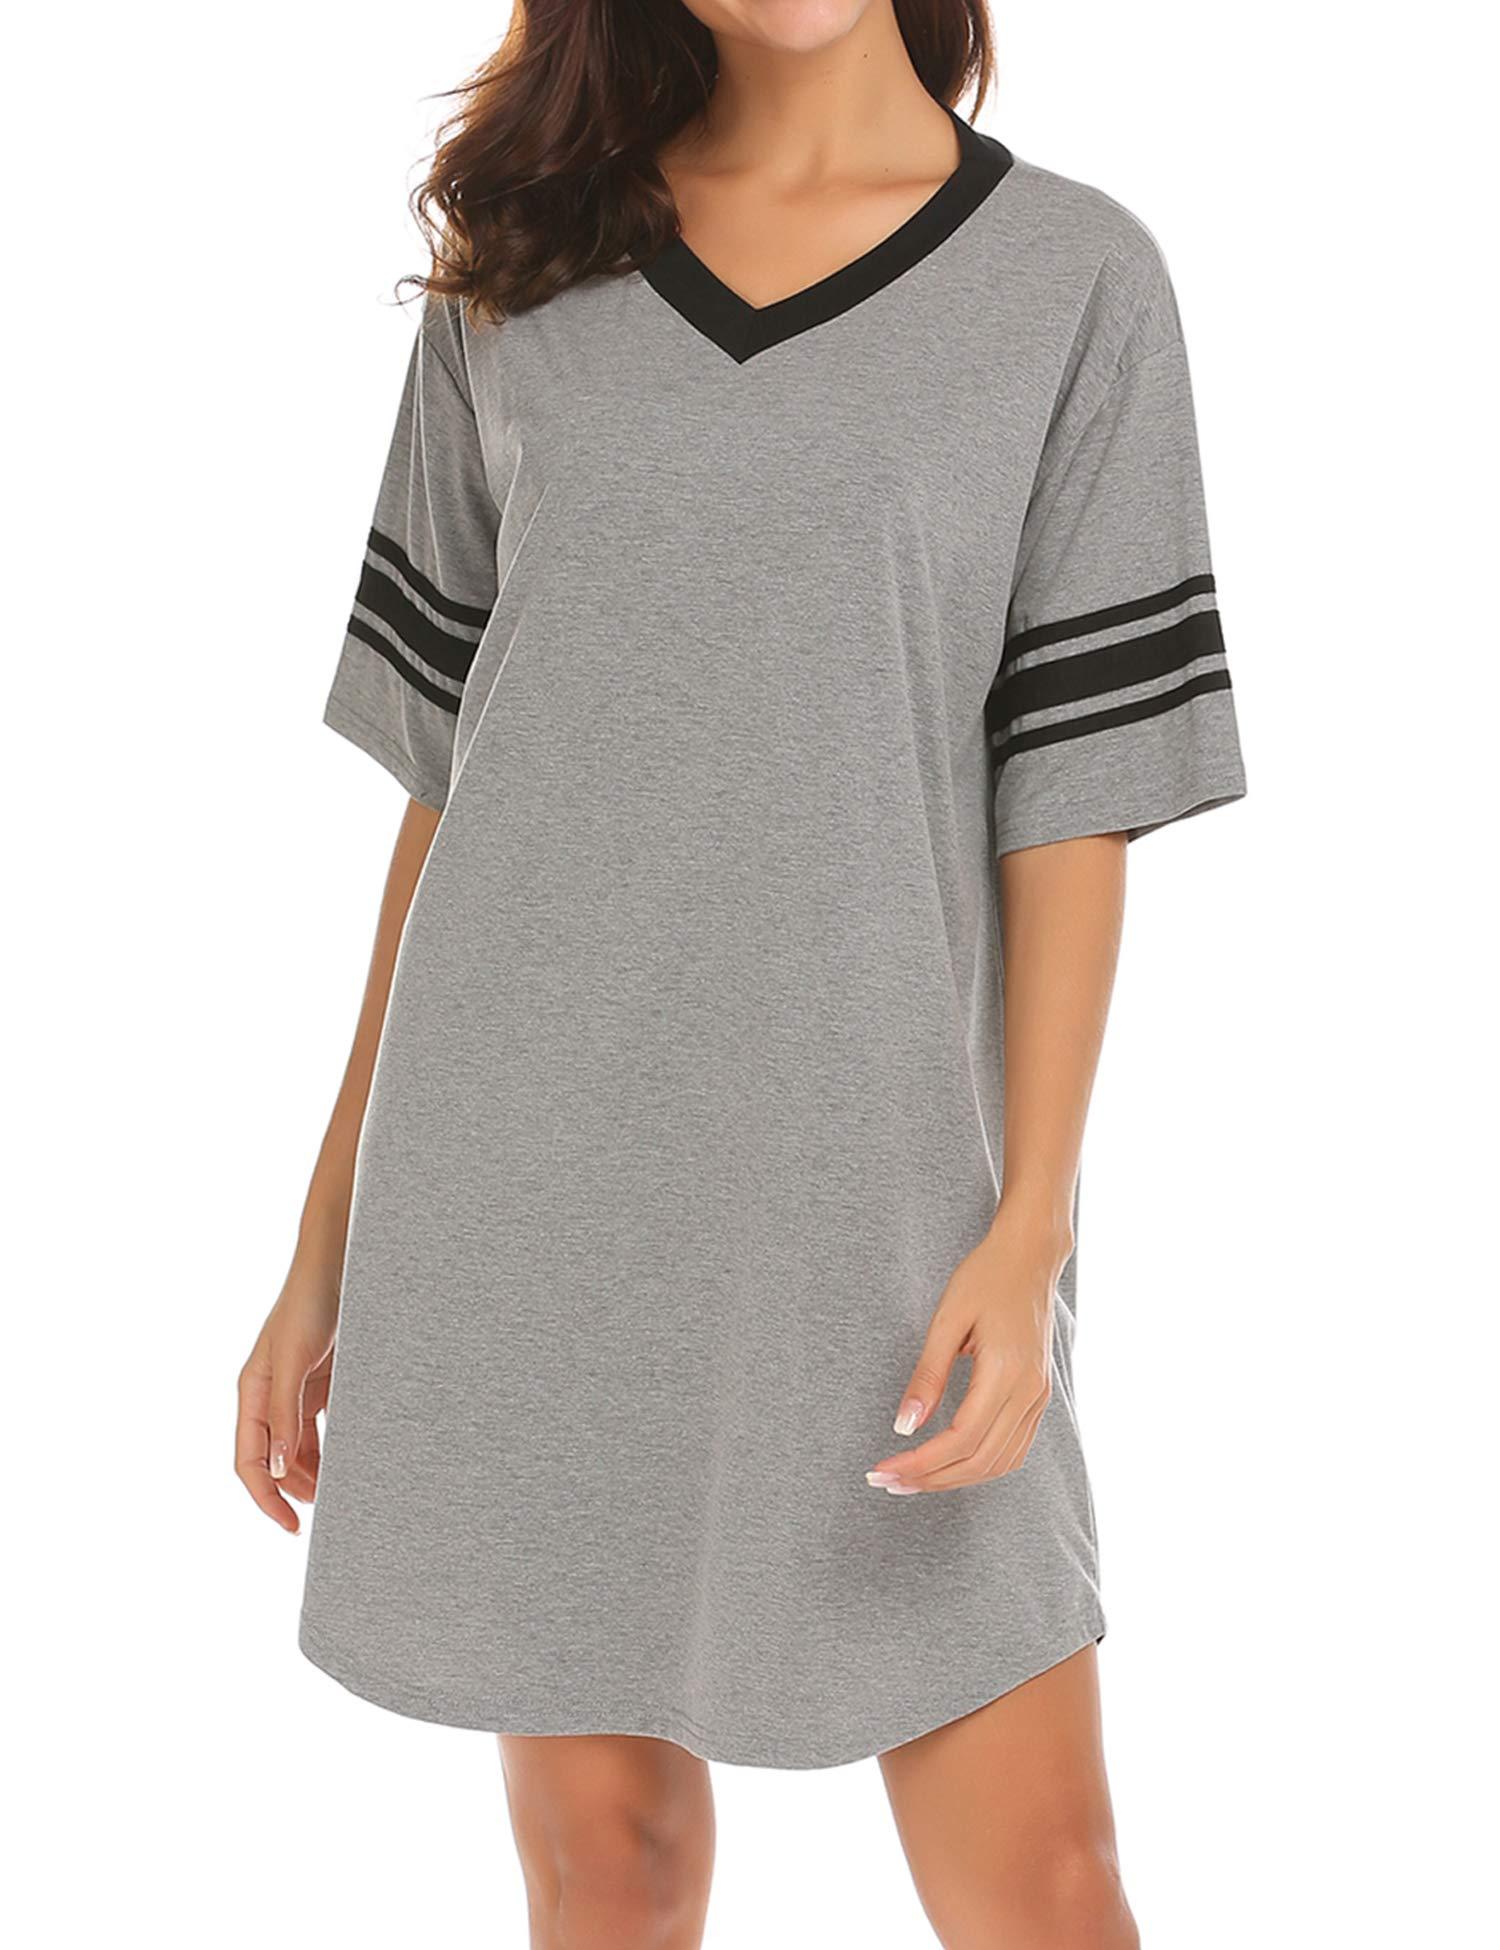 Ekouaer Women's Nightgown Cotton Sleep Shirt V Neck Short Sleeve Loose Comfy Pajama Sleepwear,A_grey,X-Large by Ekouaer